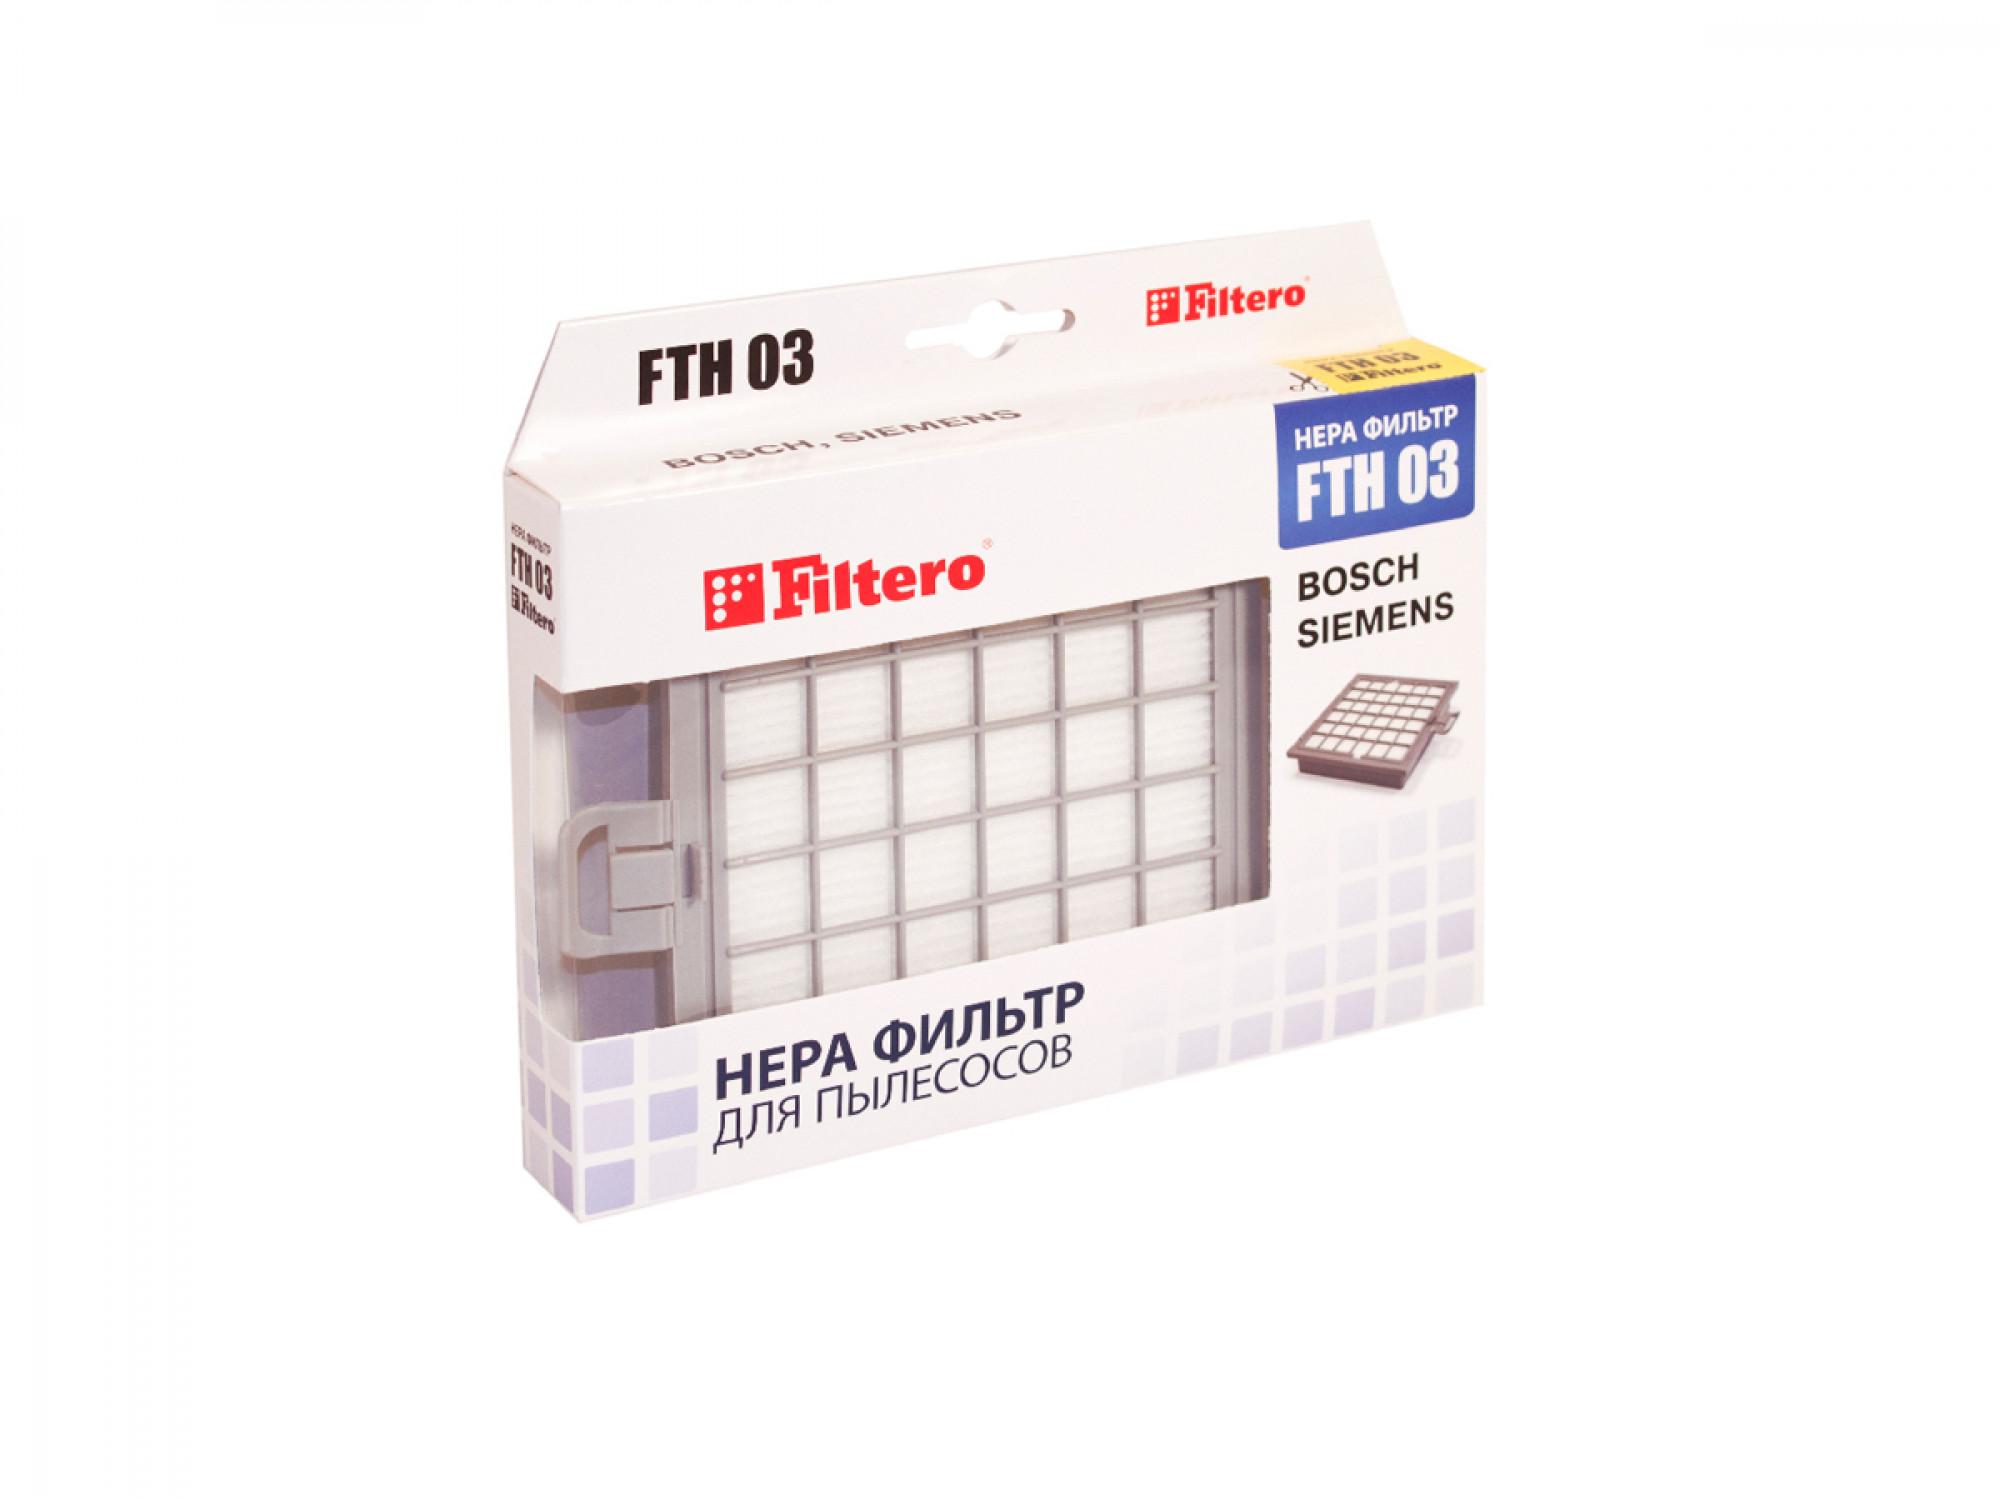 փոշեկուլի զտիչ FILTERO FTH 03 HEPA